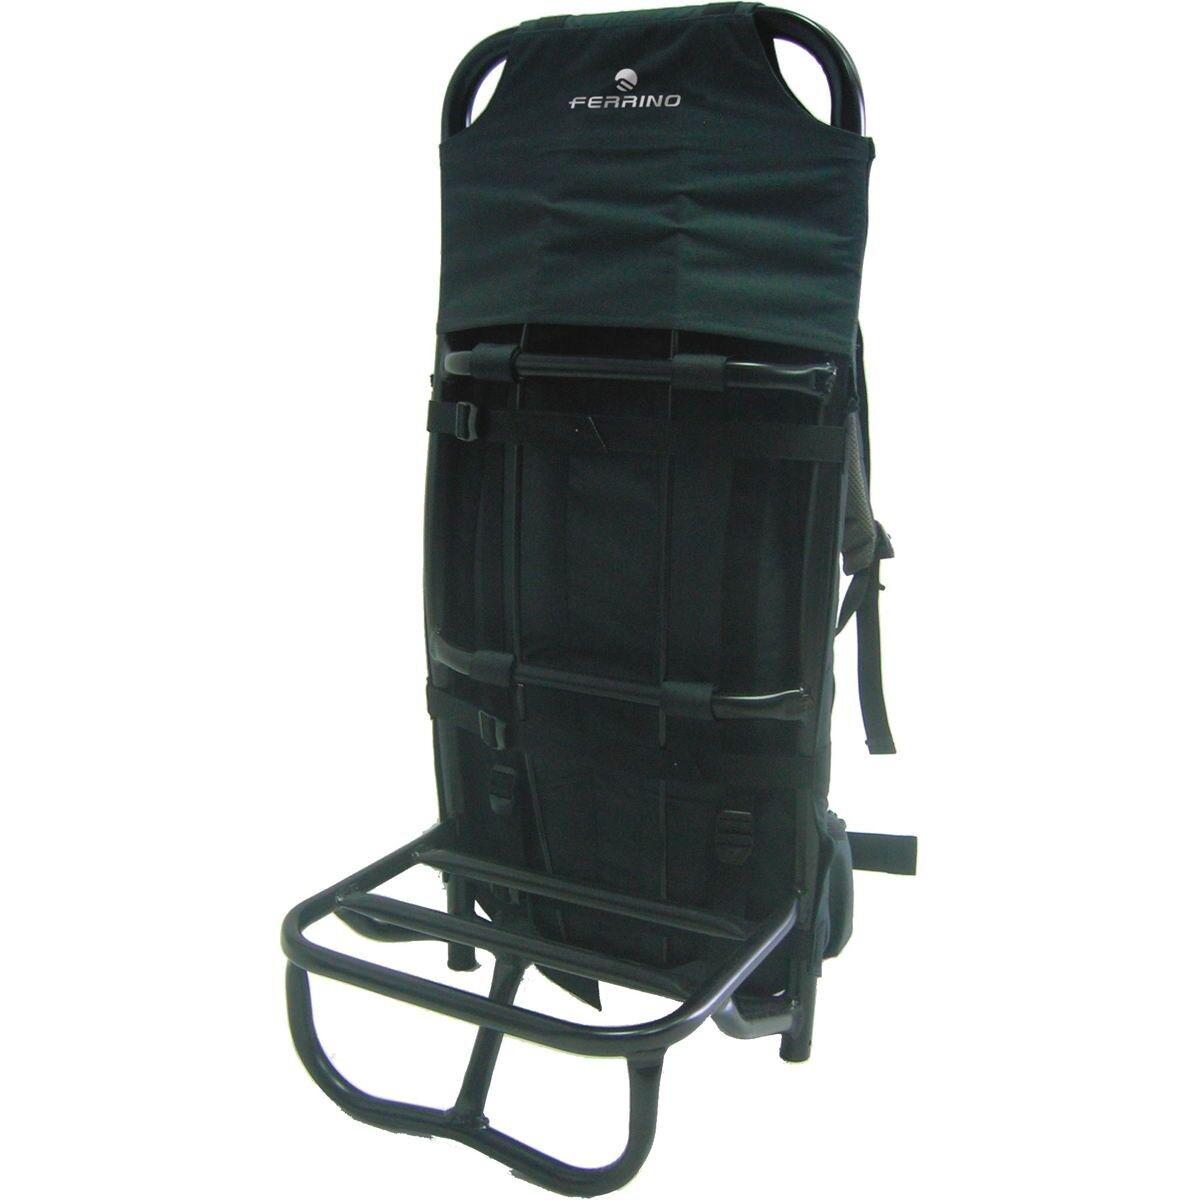 Ferrino Tragegestell Alu-Frame Kraxel Lastenkraxel 2,3 kg bis 75 kg Traglast NEU